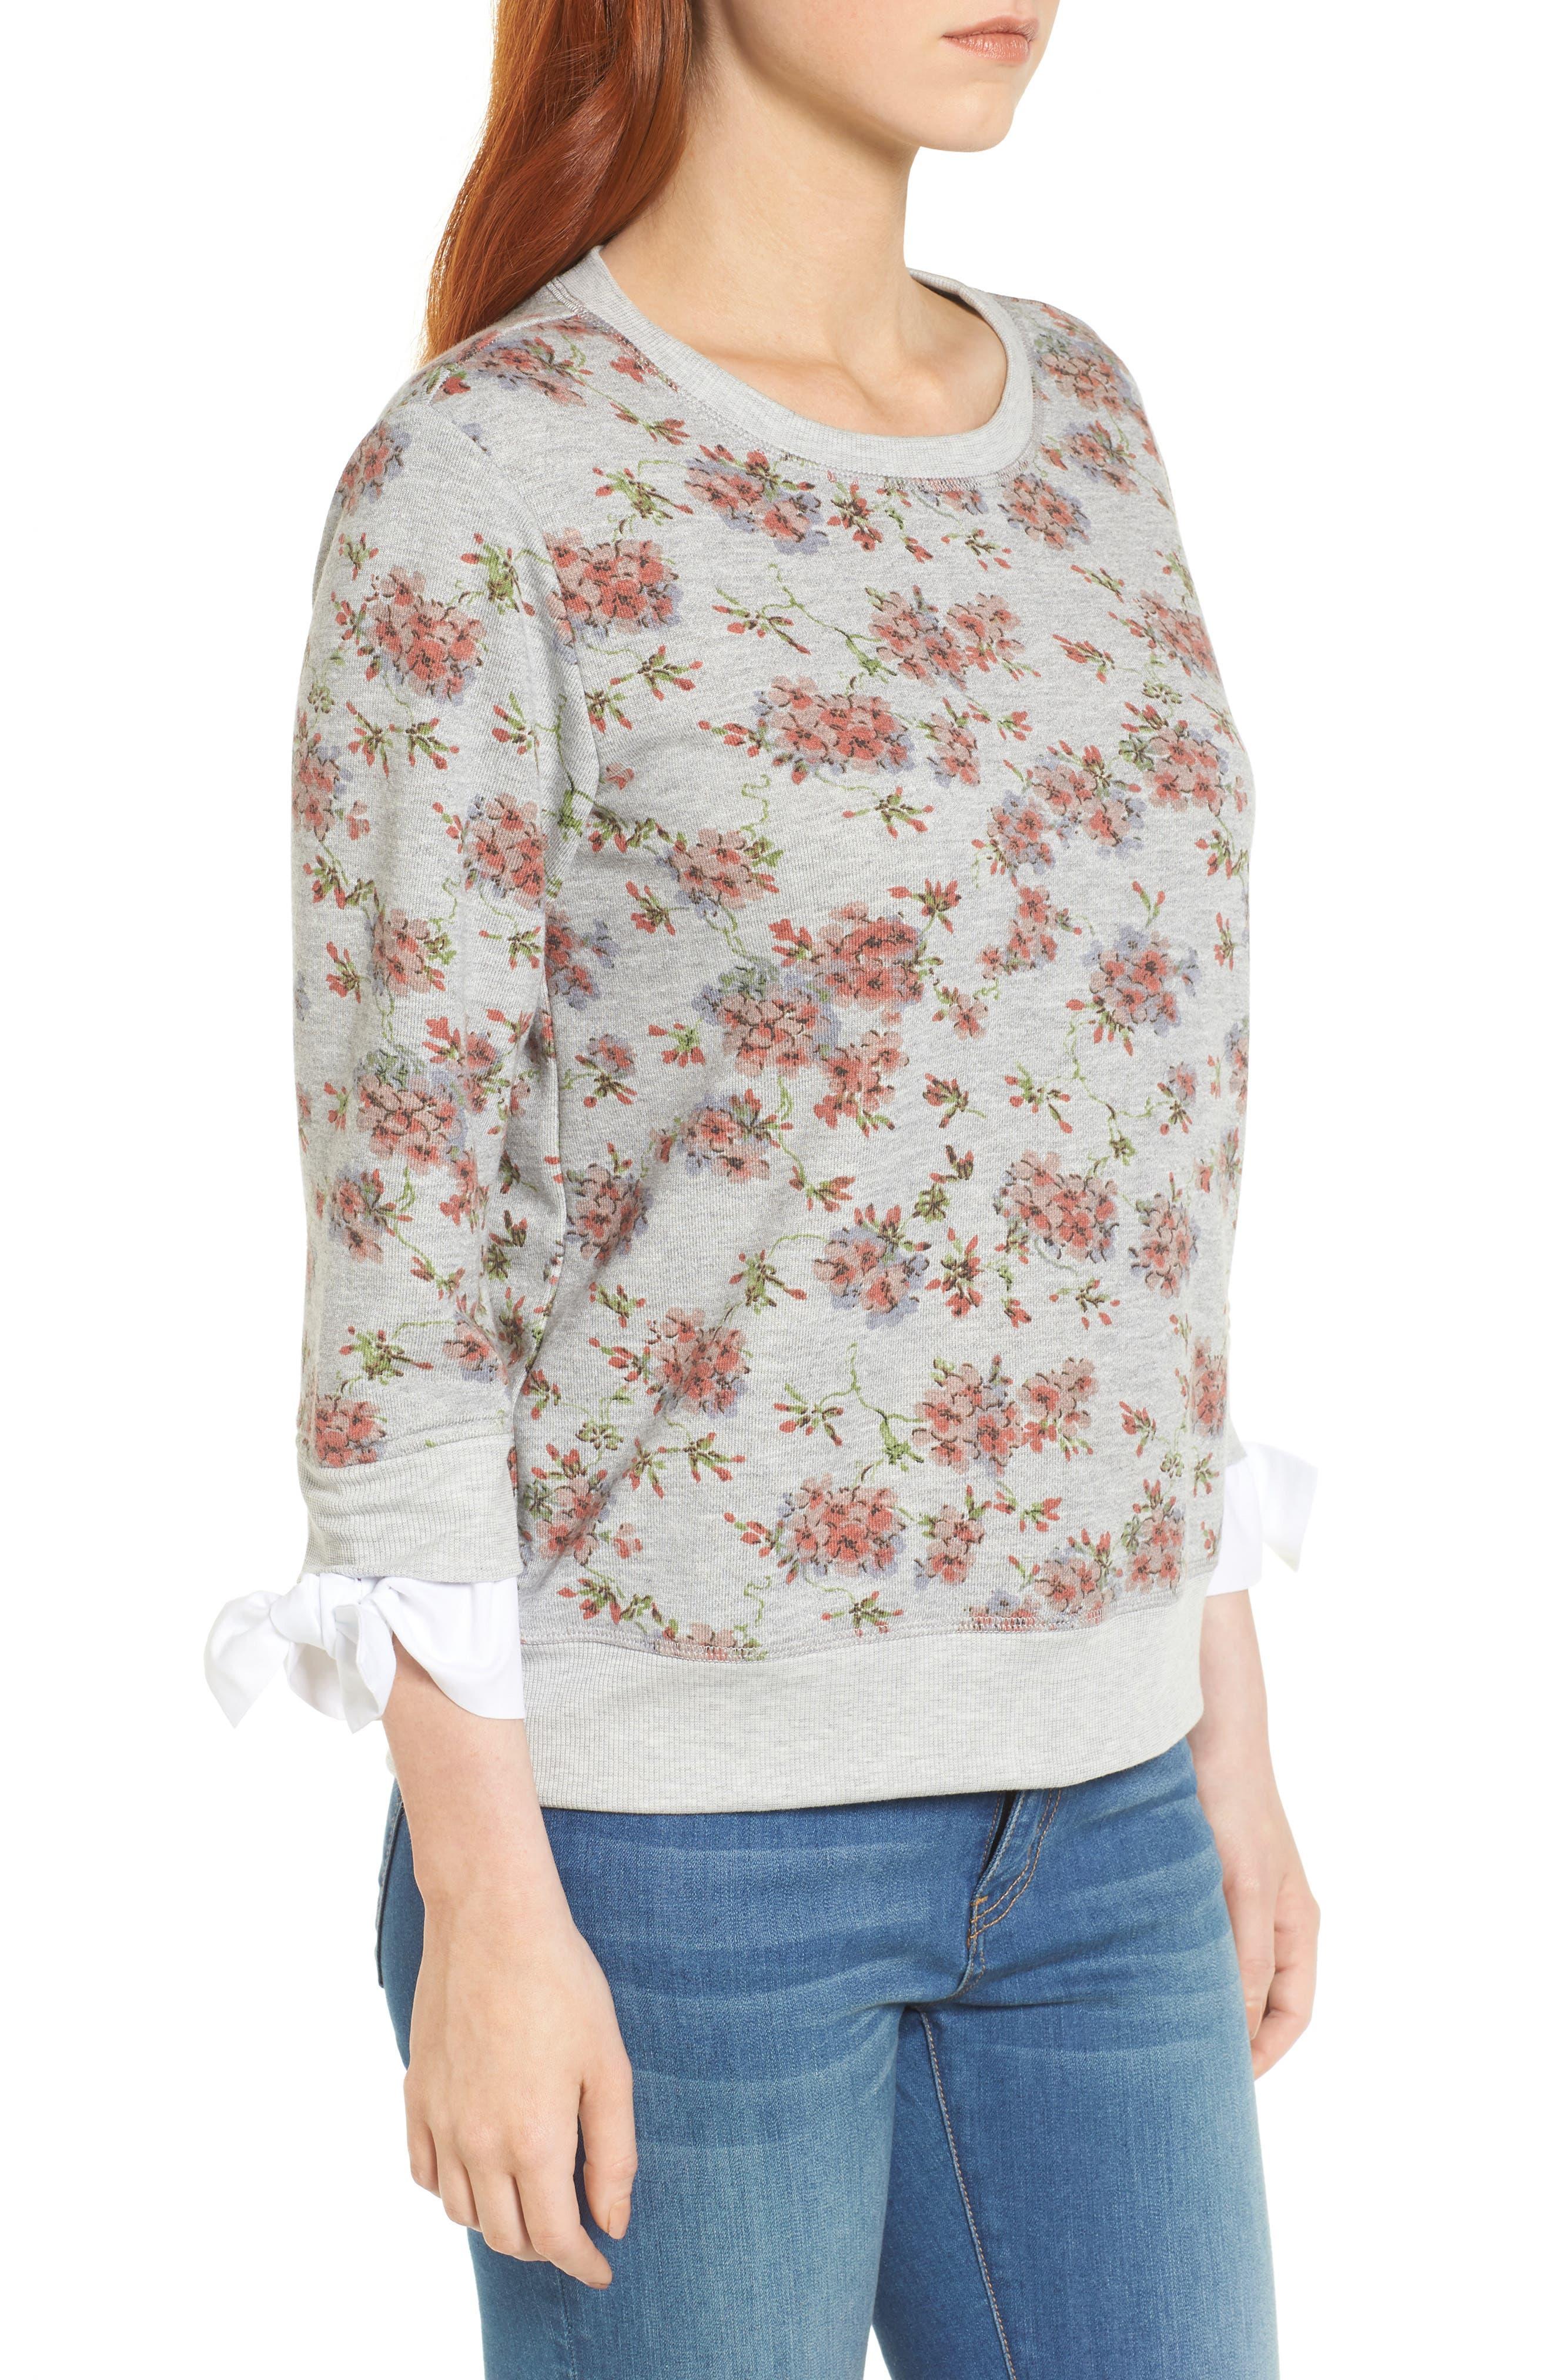 Poplin Cuff Sweatshirt,                             Alternate thumbnail 3, color,                             Grey Blush Floral W/ White